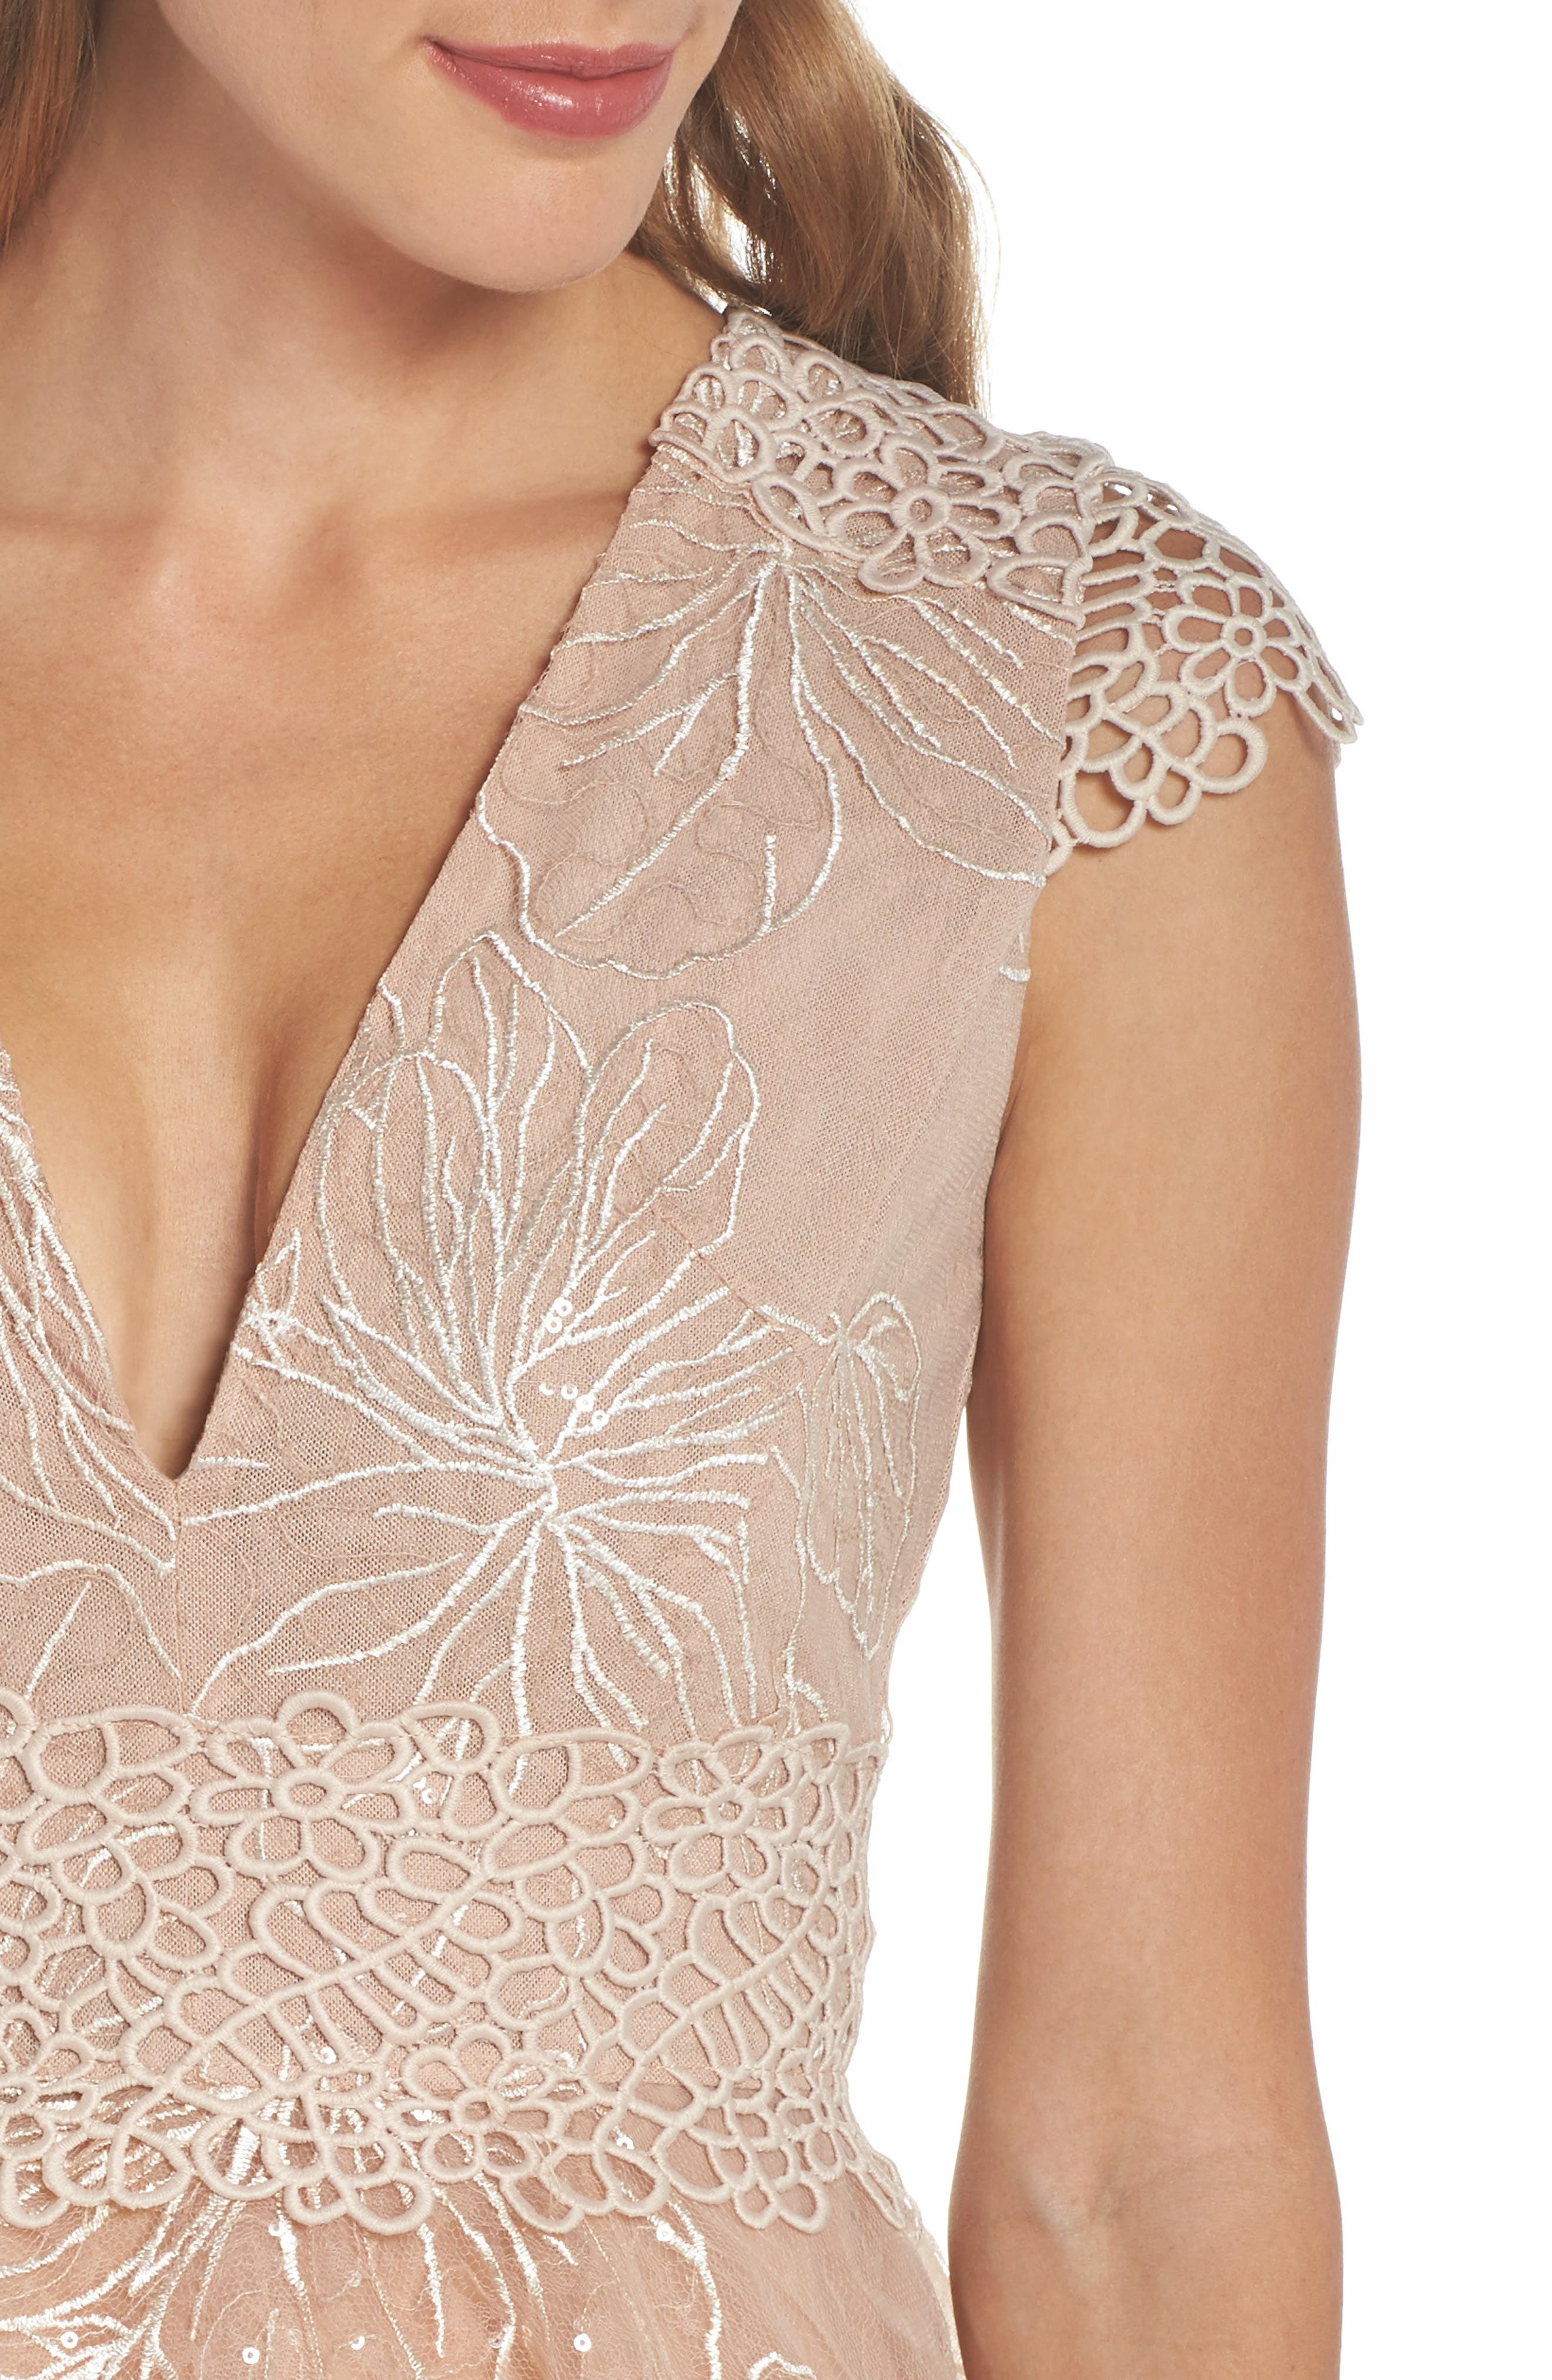 Fiore Sequin Fit & Flare Dress,                             Alternate thumbnail 4, color,                             Beige